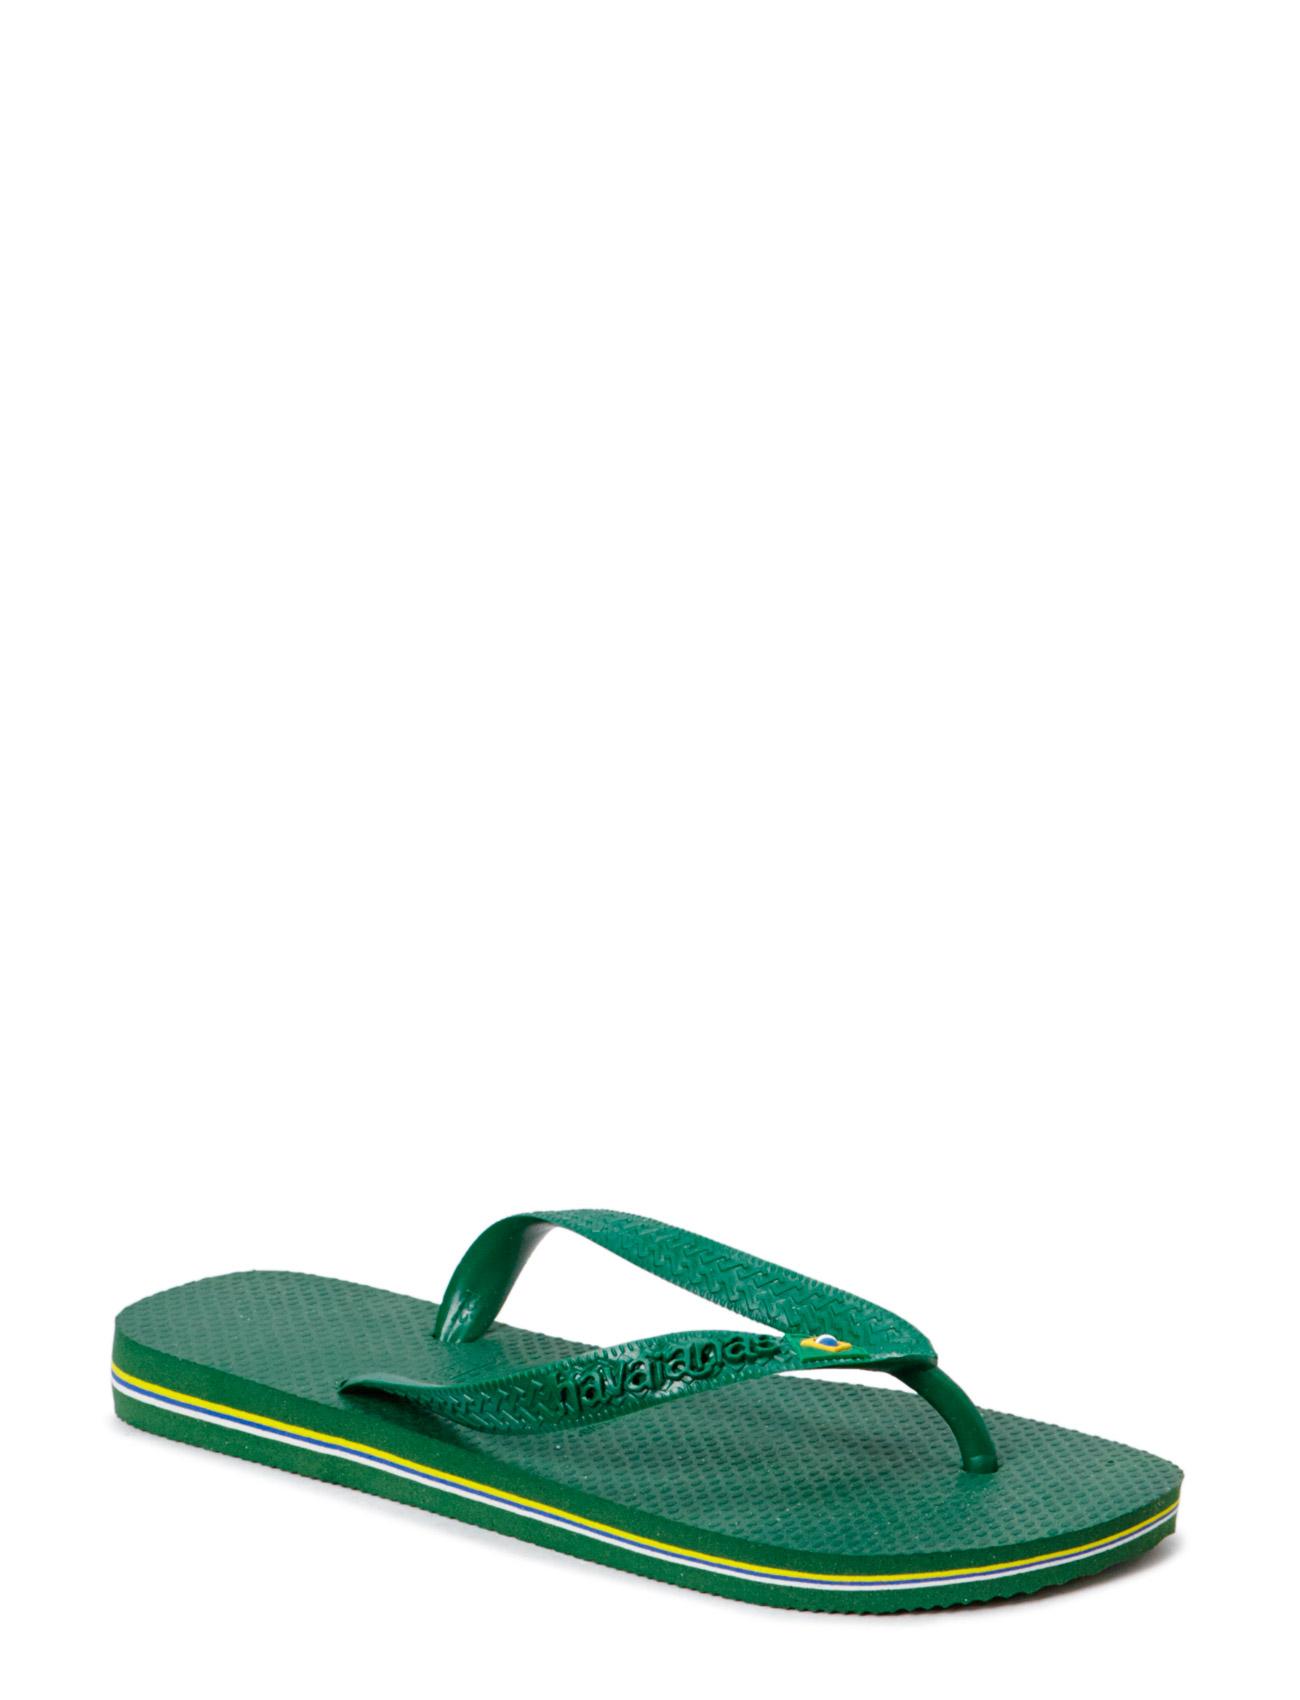 Brasil Havaianas Sandaler til Herrer i